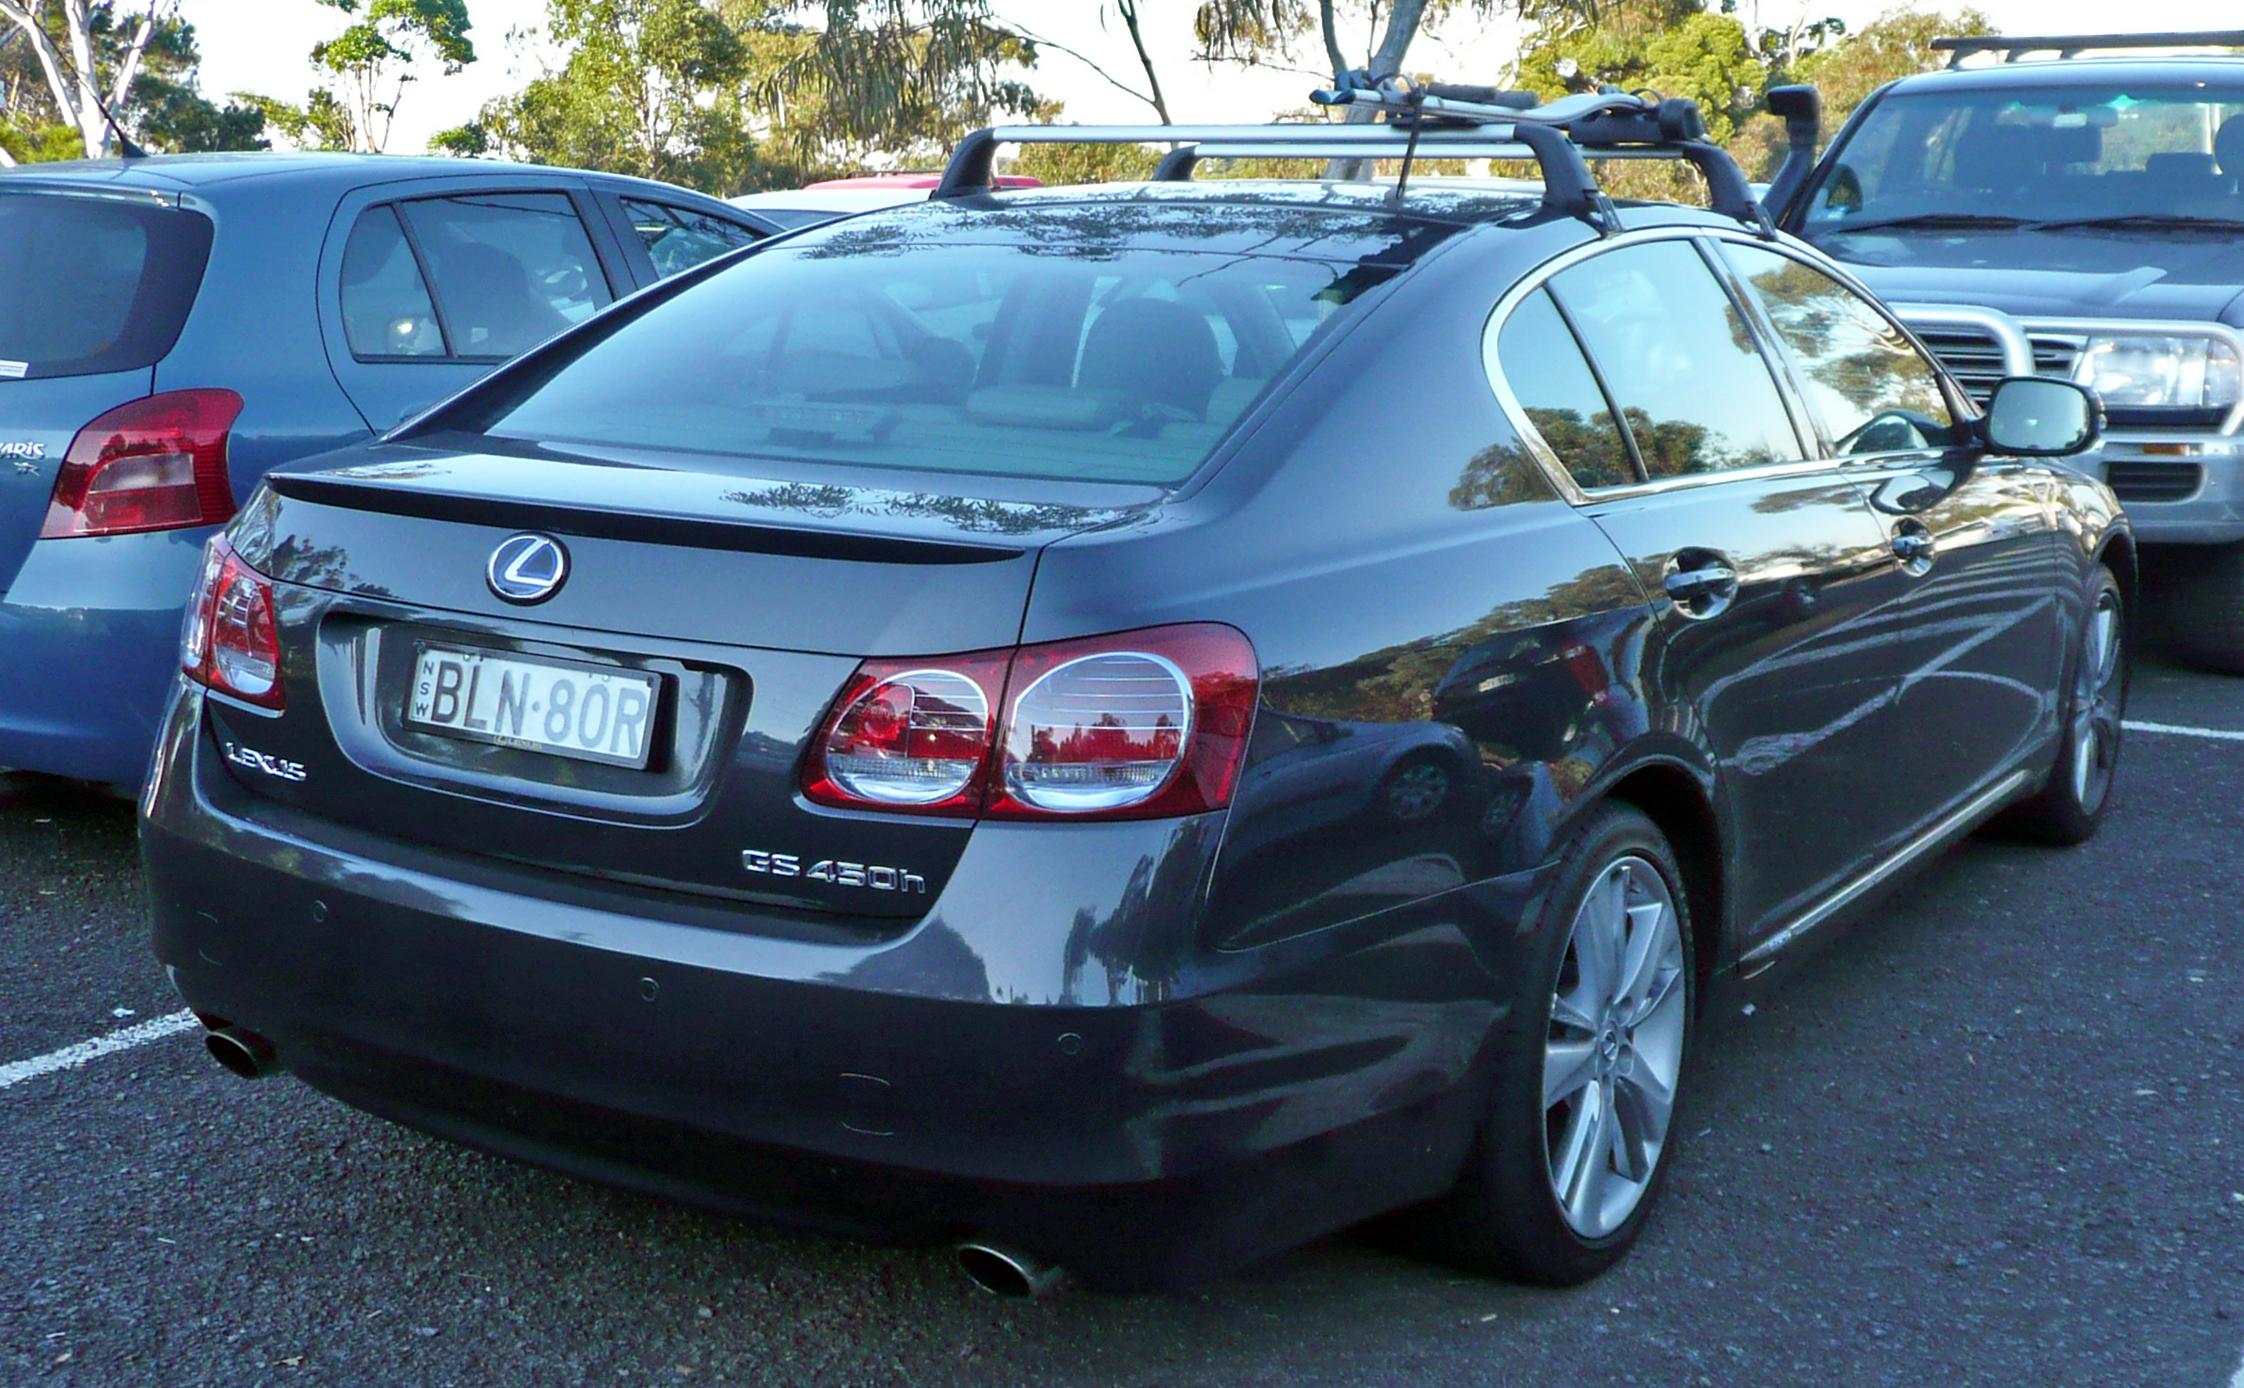 https://upload.wikimedia.org/wikipedia/commons/1/1c/2009-2010_Lexus_GS_450h_%28GWS191R%29_sedan_02.jpg